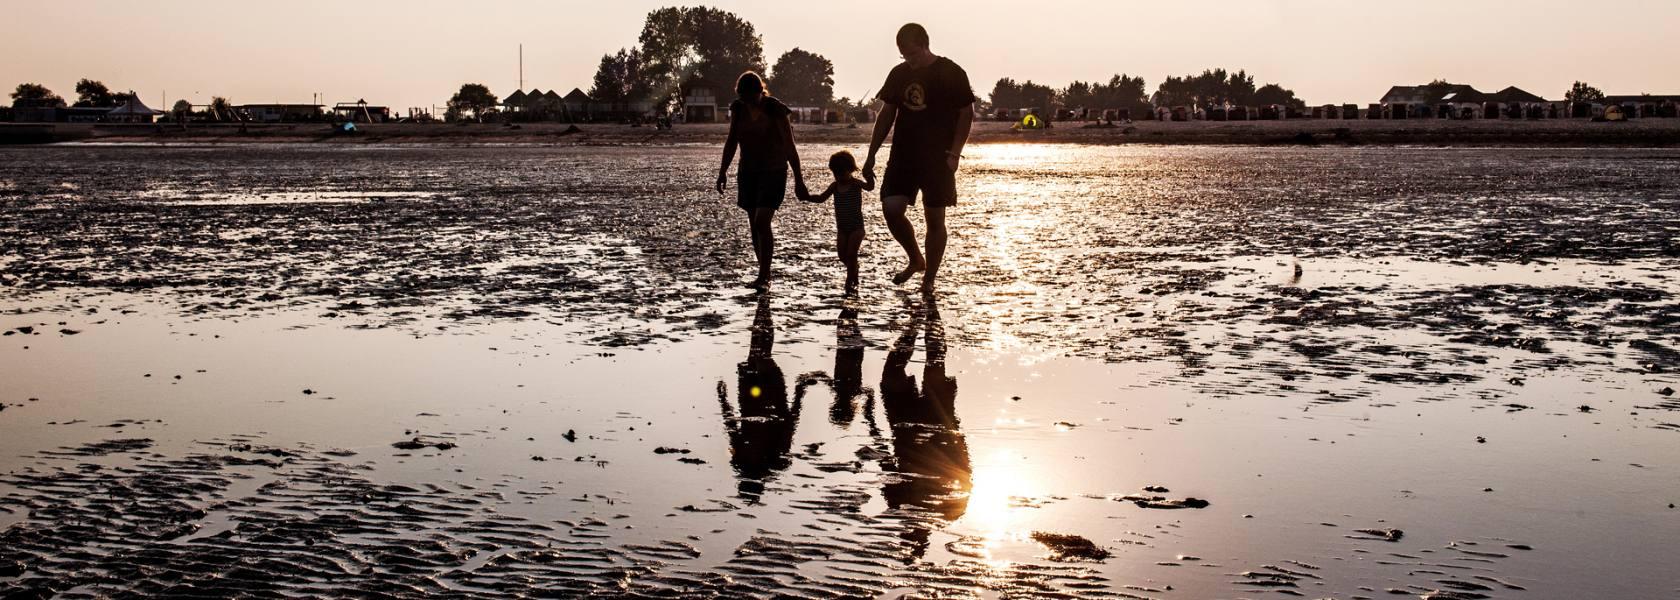 Familie im Watt, © Florian Trykowski